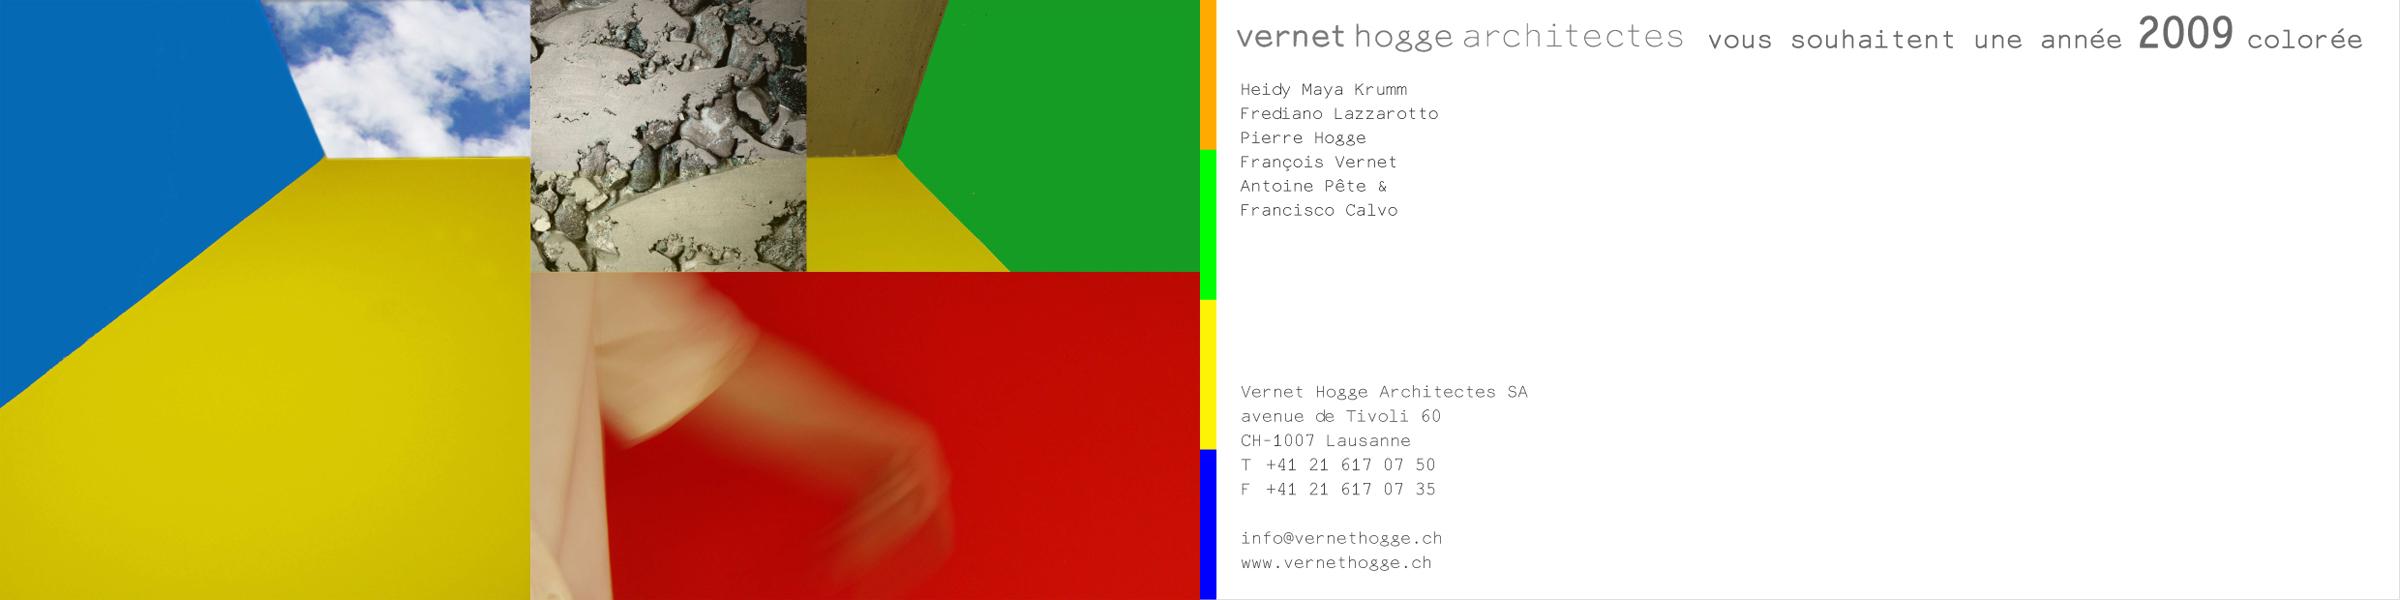 carte voeux 2009